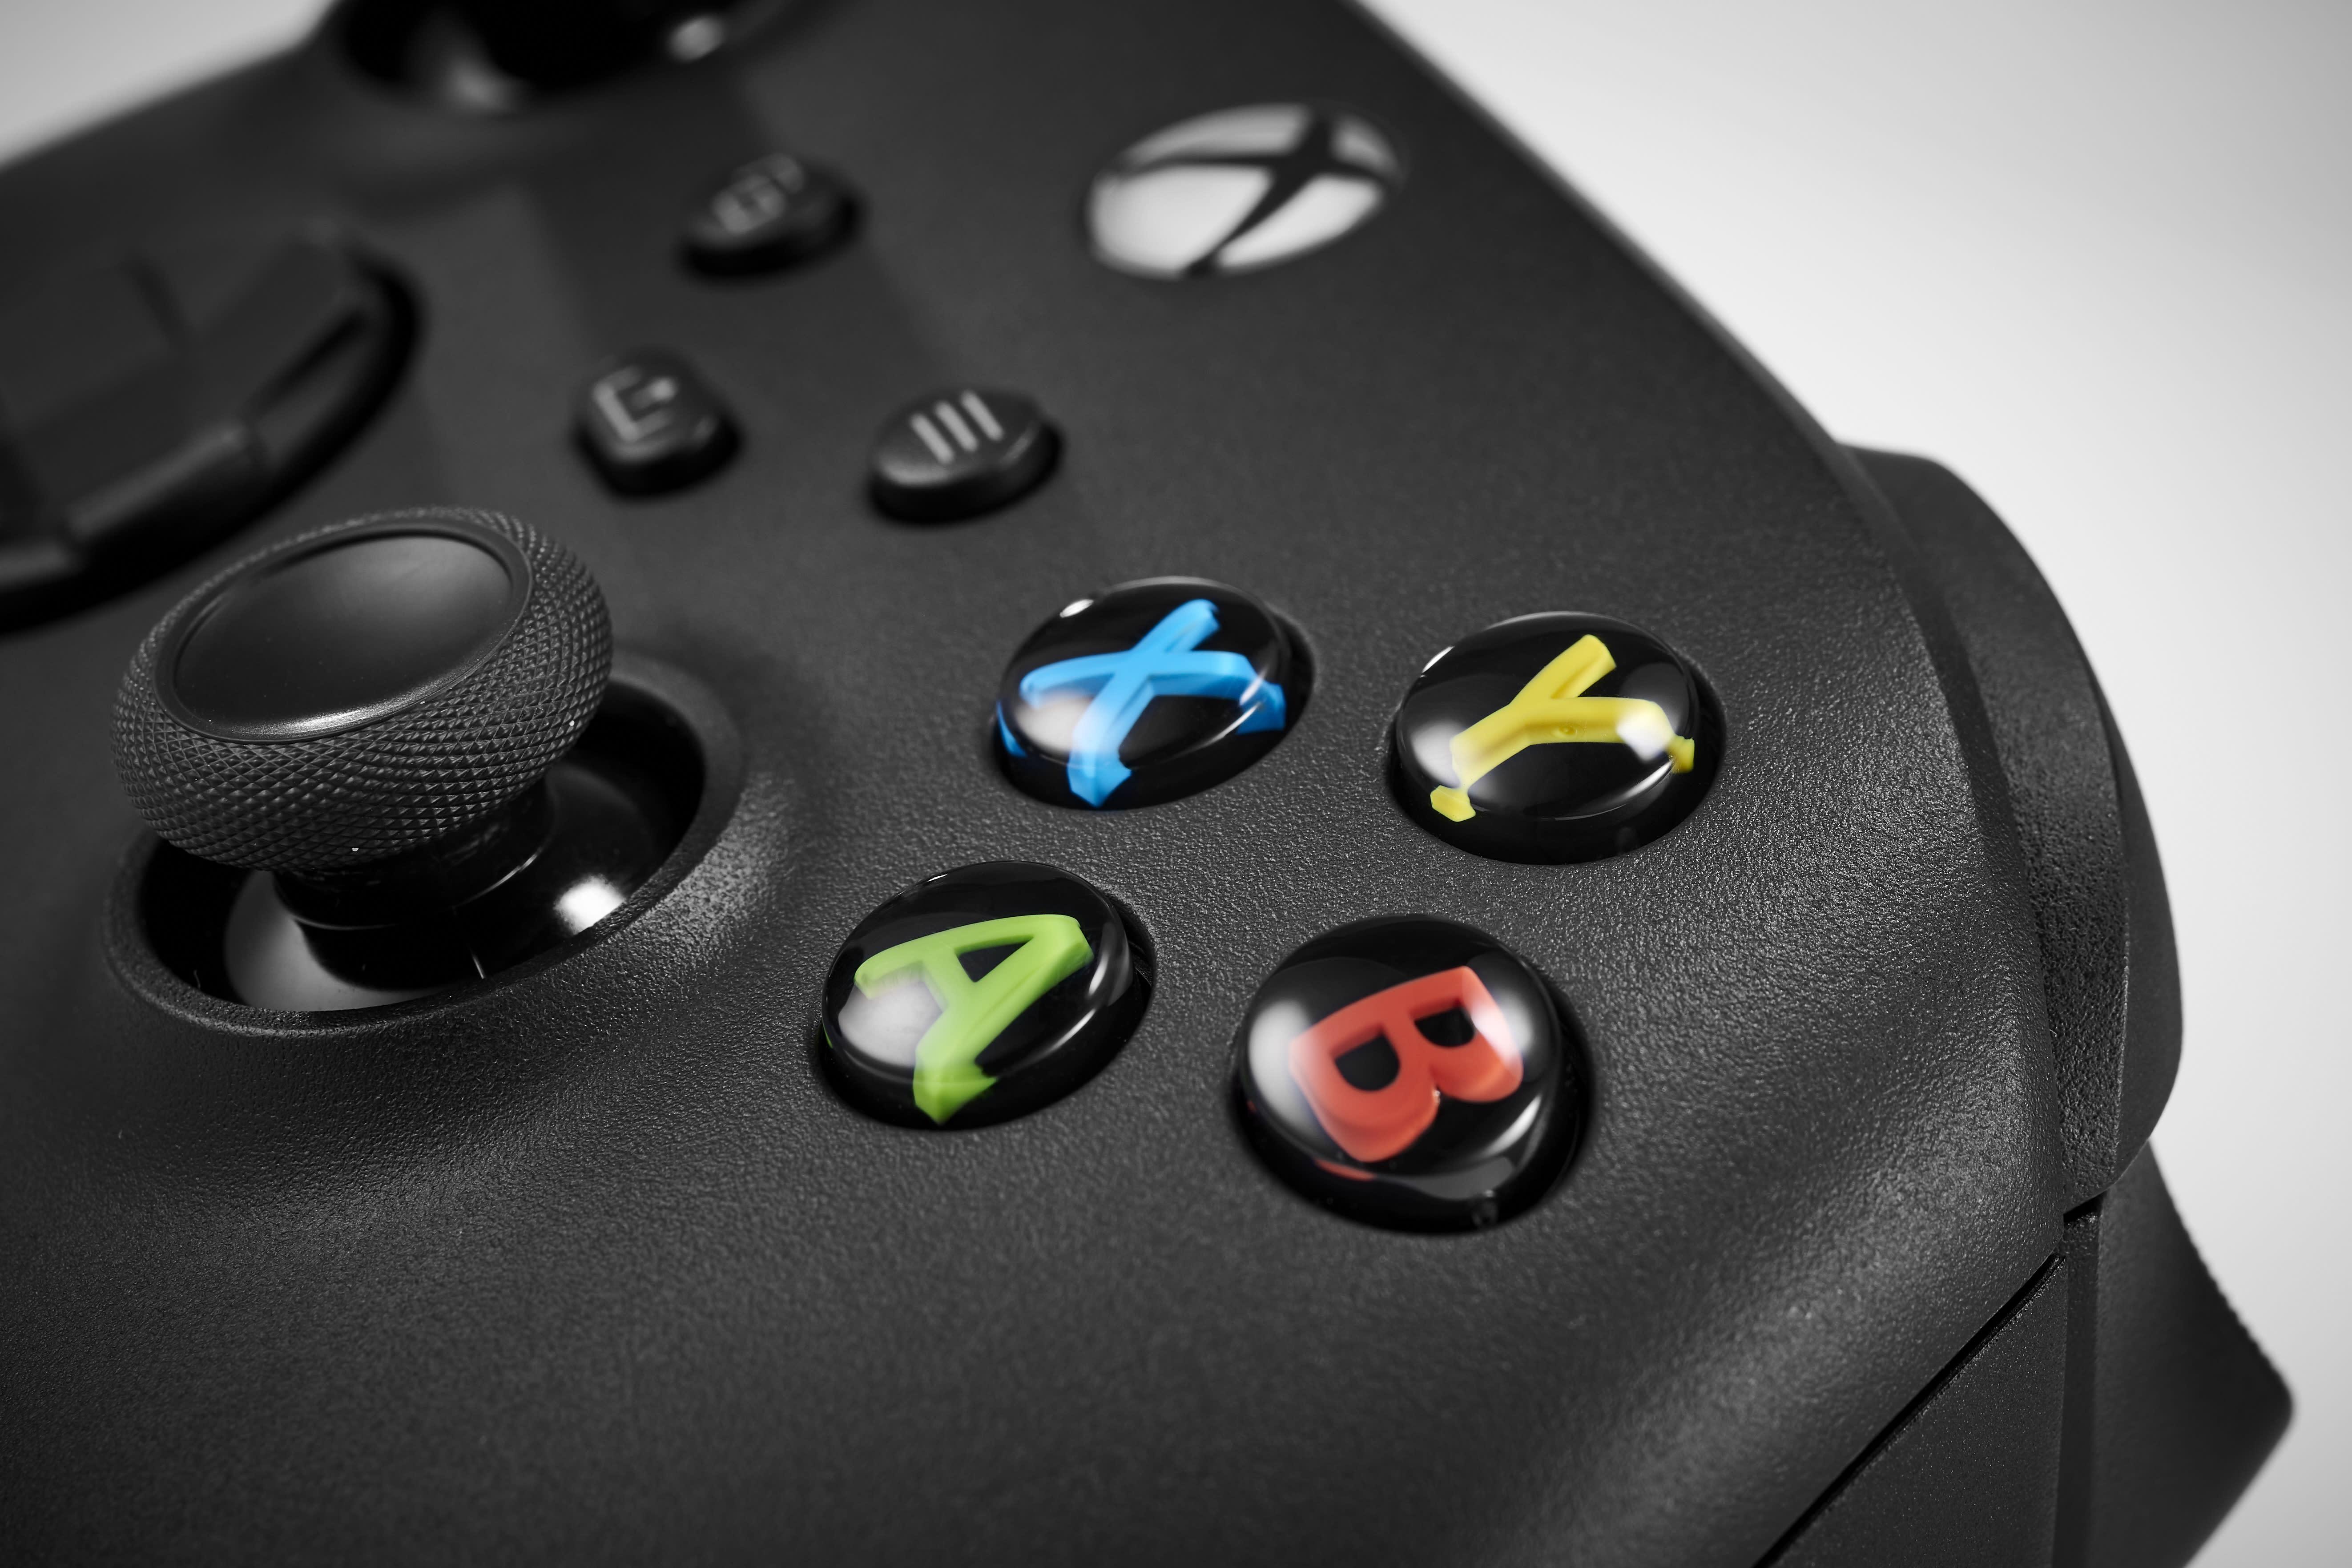 Microsoft starts testing Xbox cloud gaming on the web - Engadget